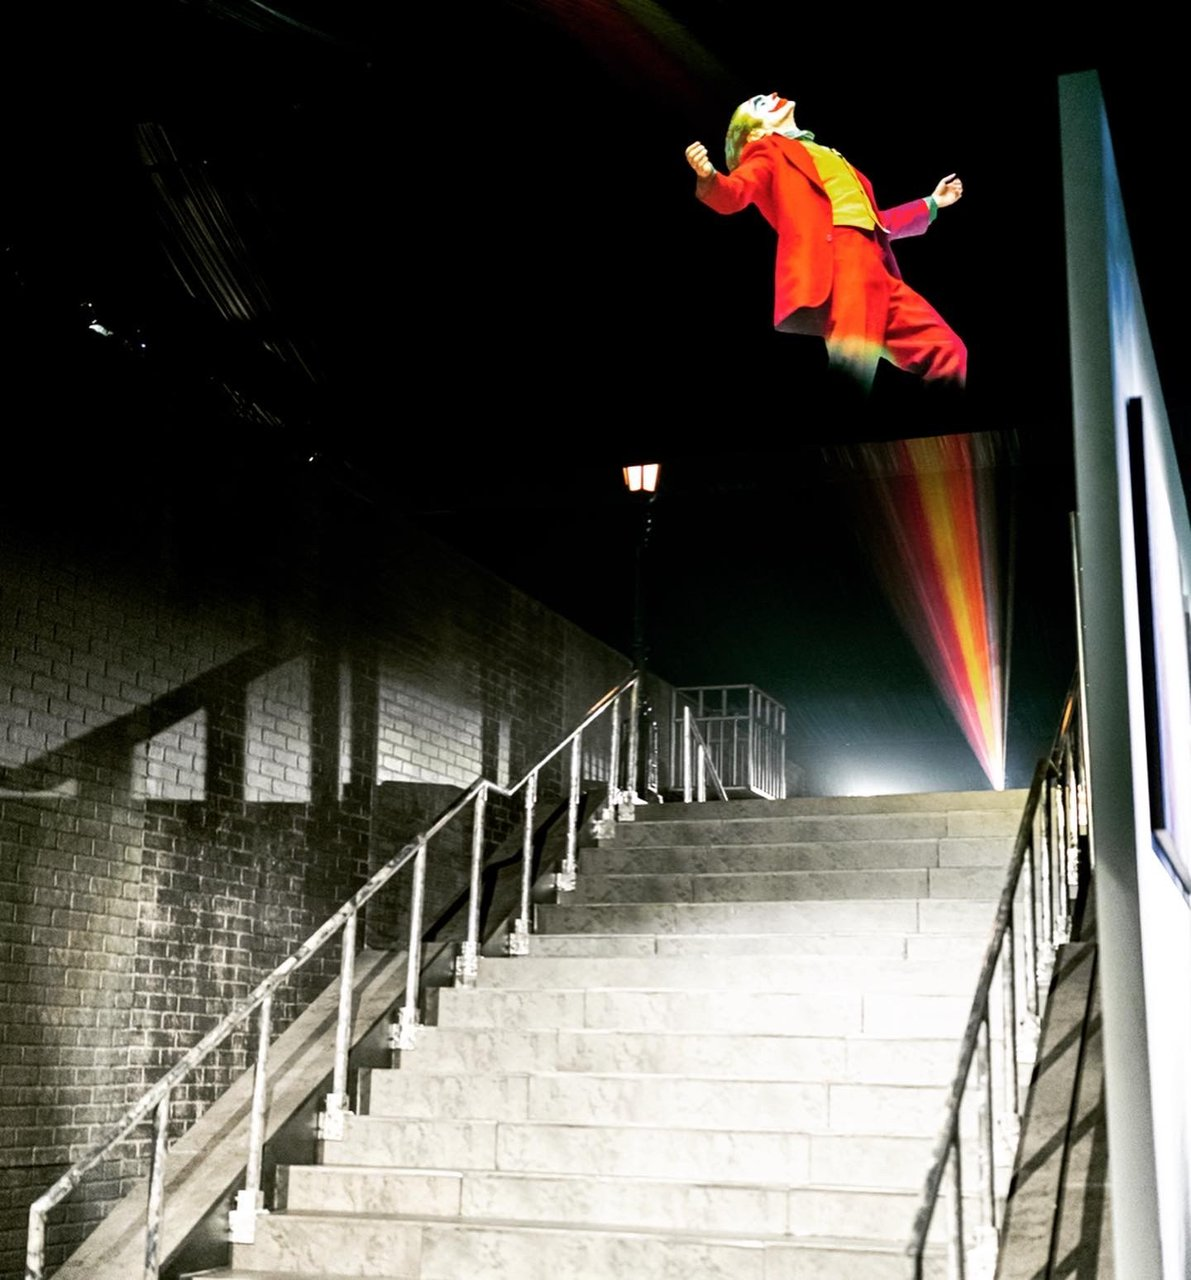 Joker Movie Premiere Afterparty photo FB4E6E63-45E4-498E-B63B-297987A4365C.jpg